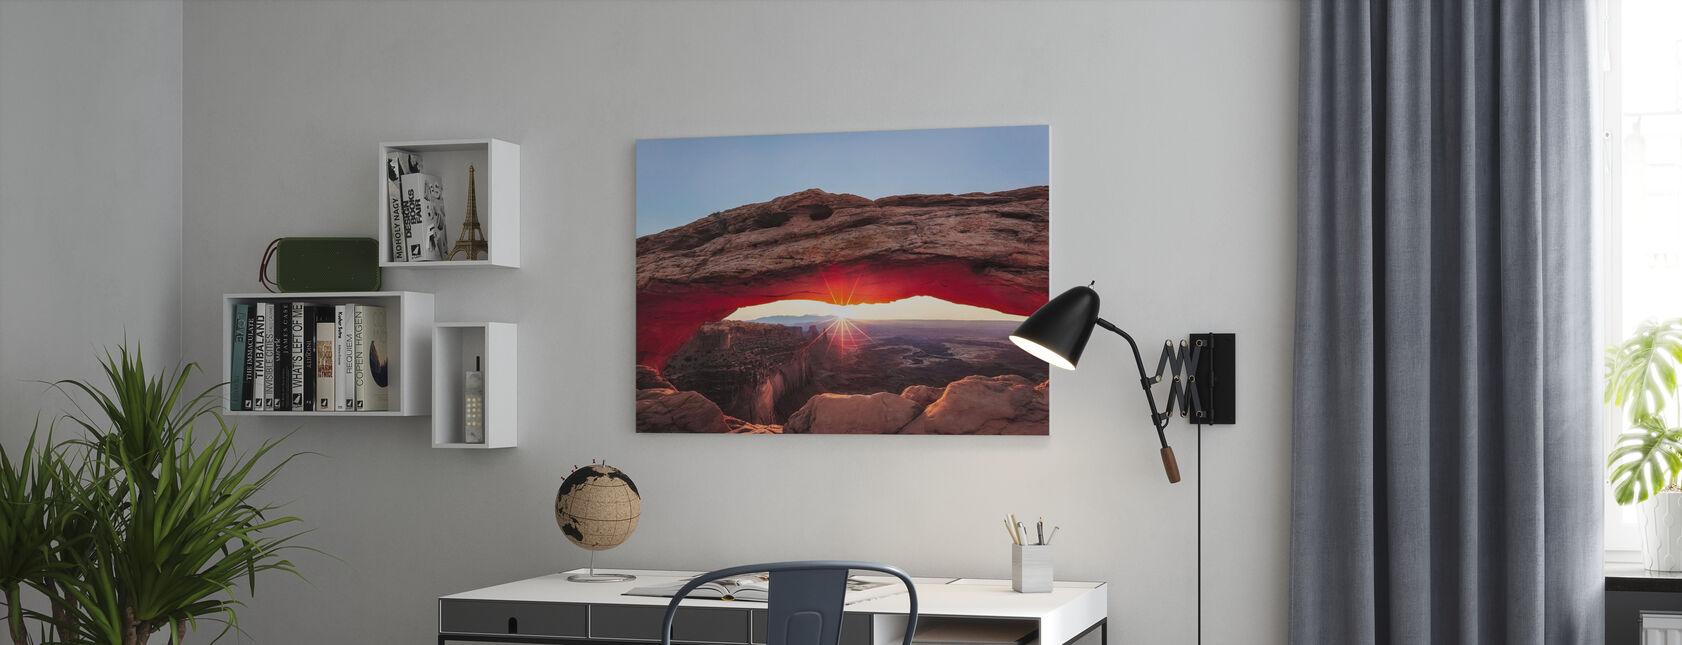 Zonsondergang Crest - Canvas print - Kantoor